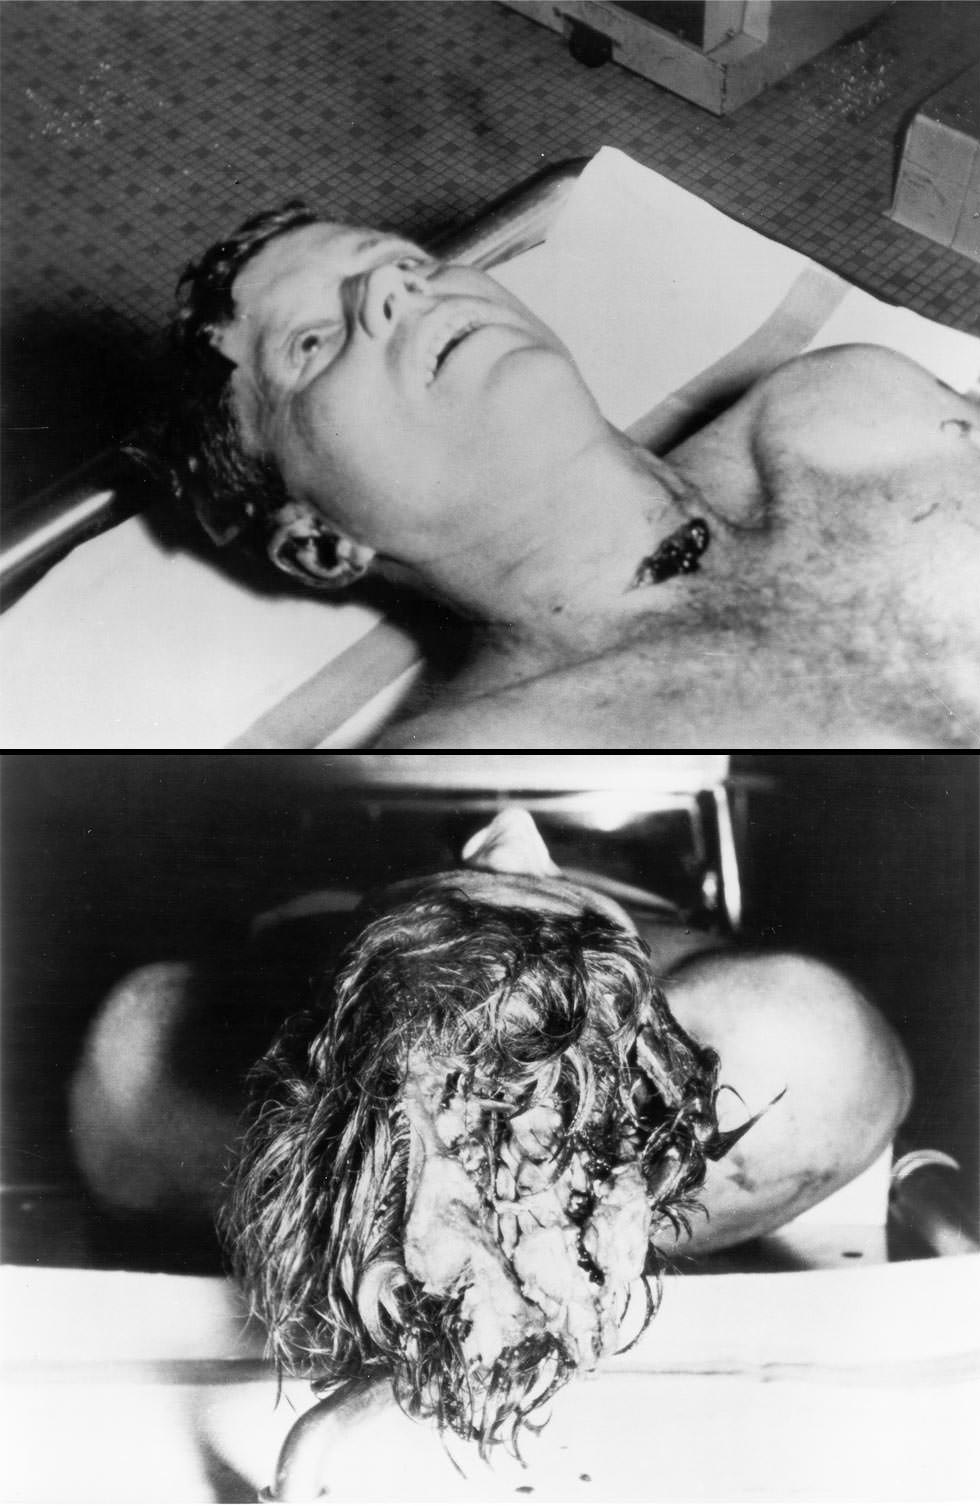 Se cumplen 48 años del asesinato de John Fitzgerald Kennedy